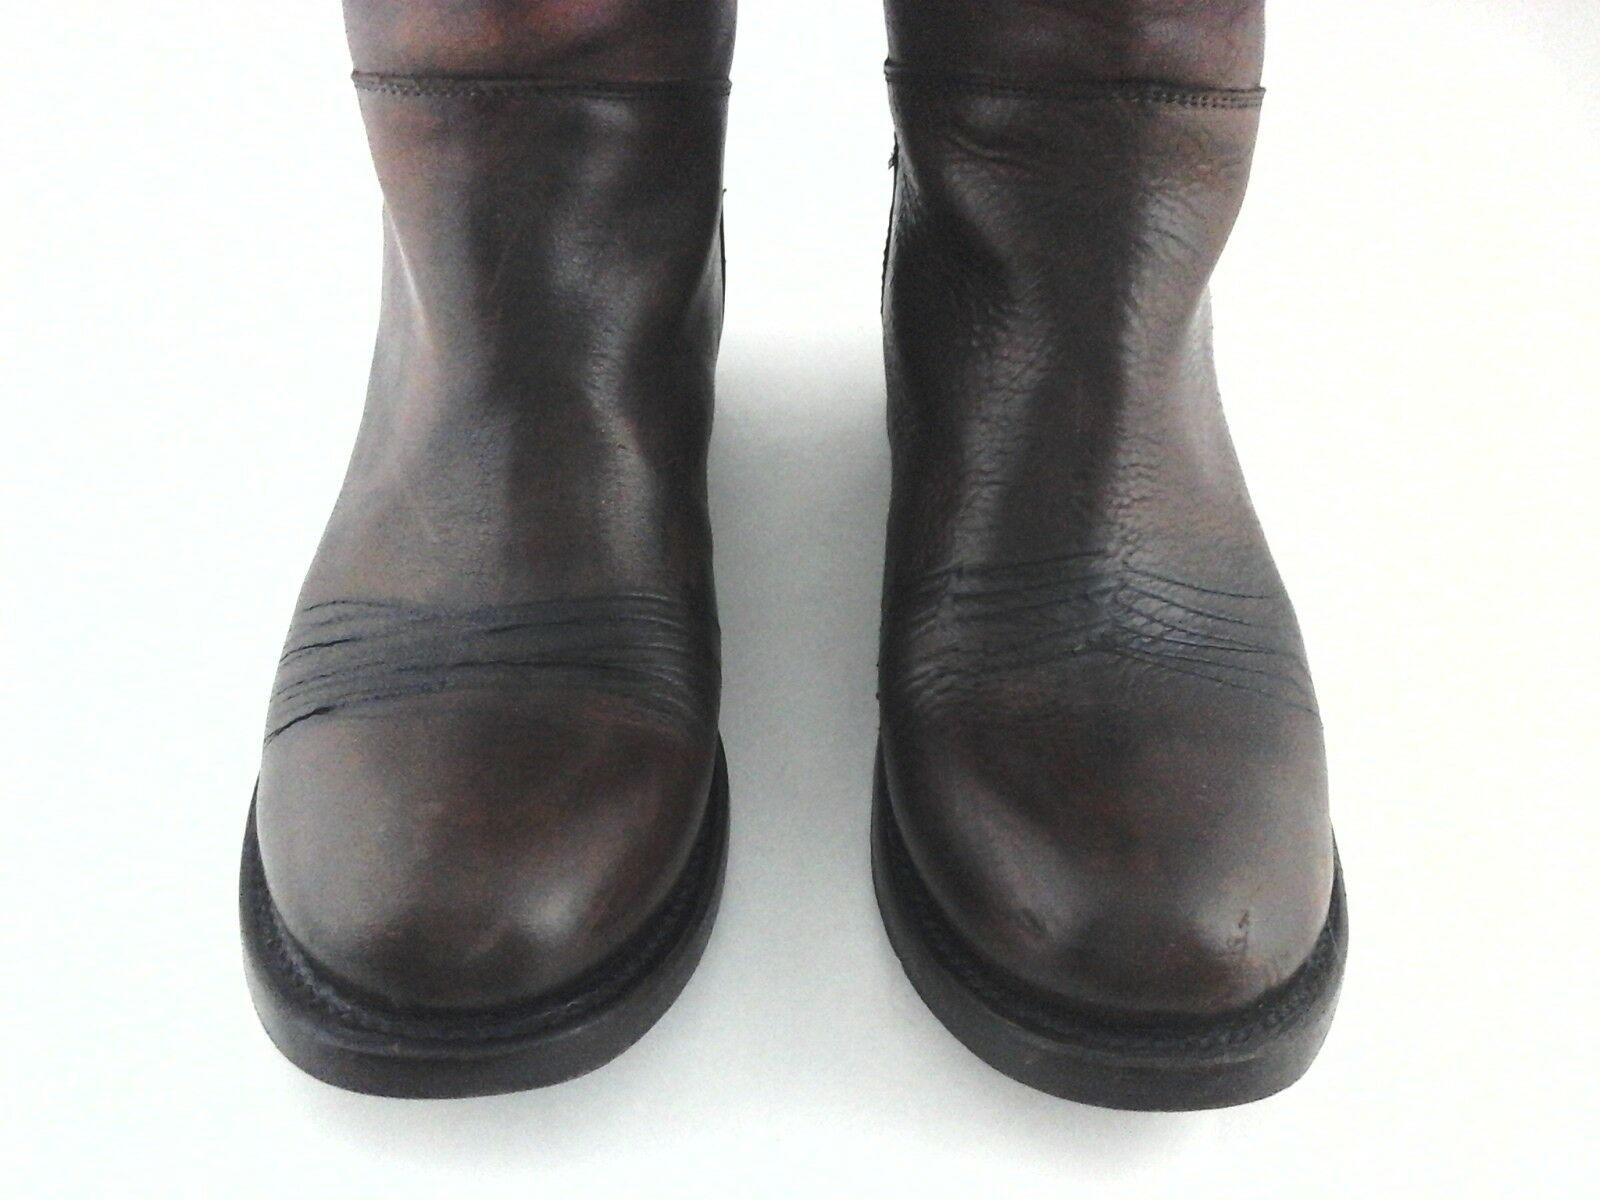 ASH Tall Riding Boots Zip Handmade Brown Brown Brown 3563 Leather Women's US 8 EU 38.5  420 b88a54